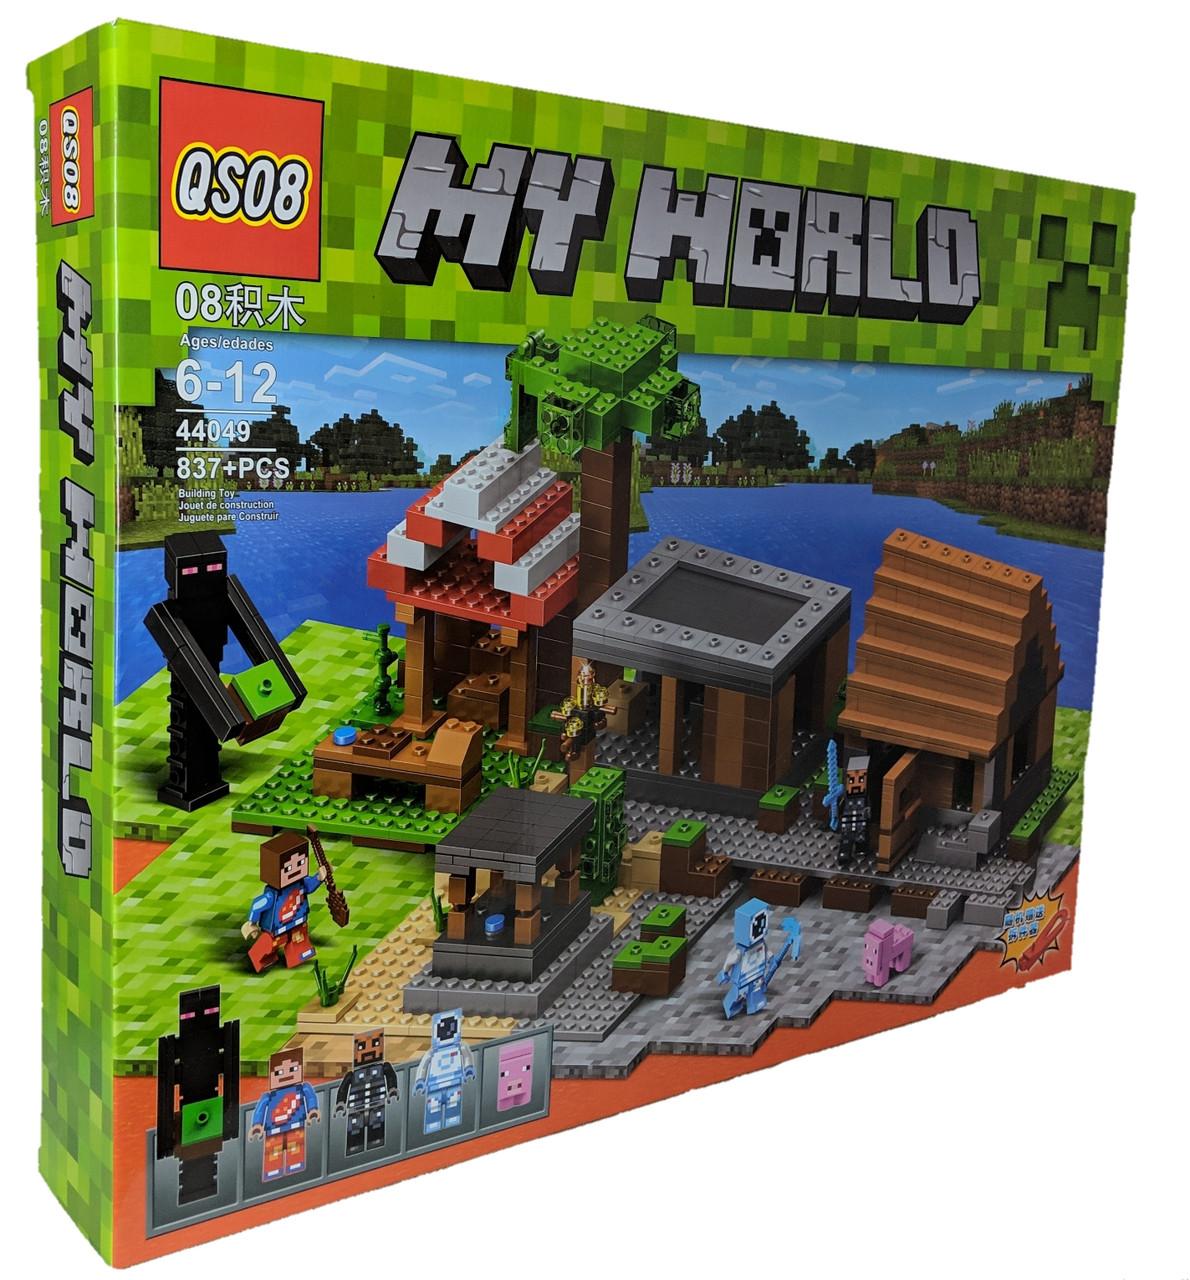 Конструктор My World 837 дет. ( копия Minecraft) 44049